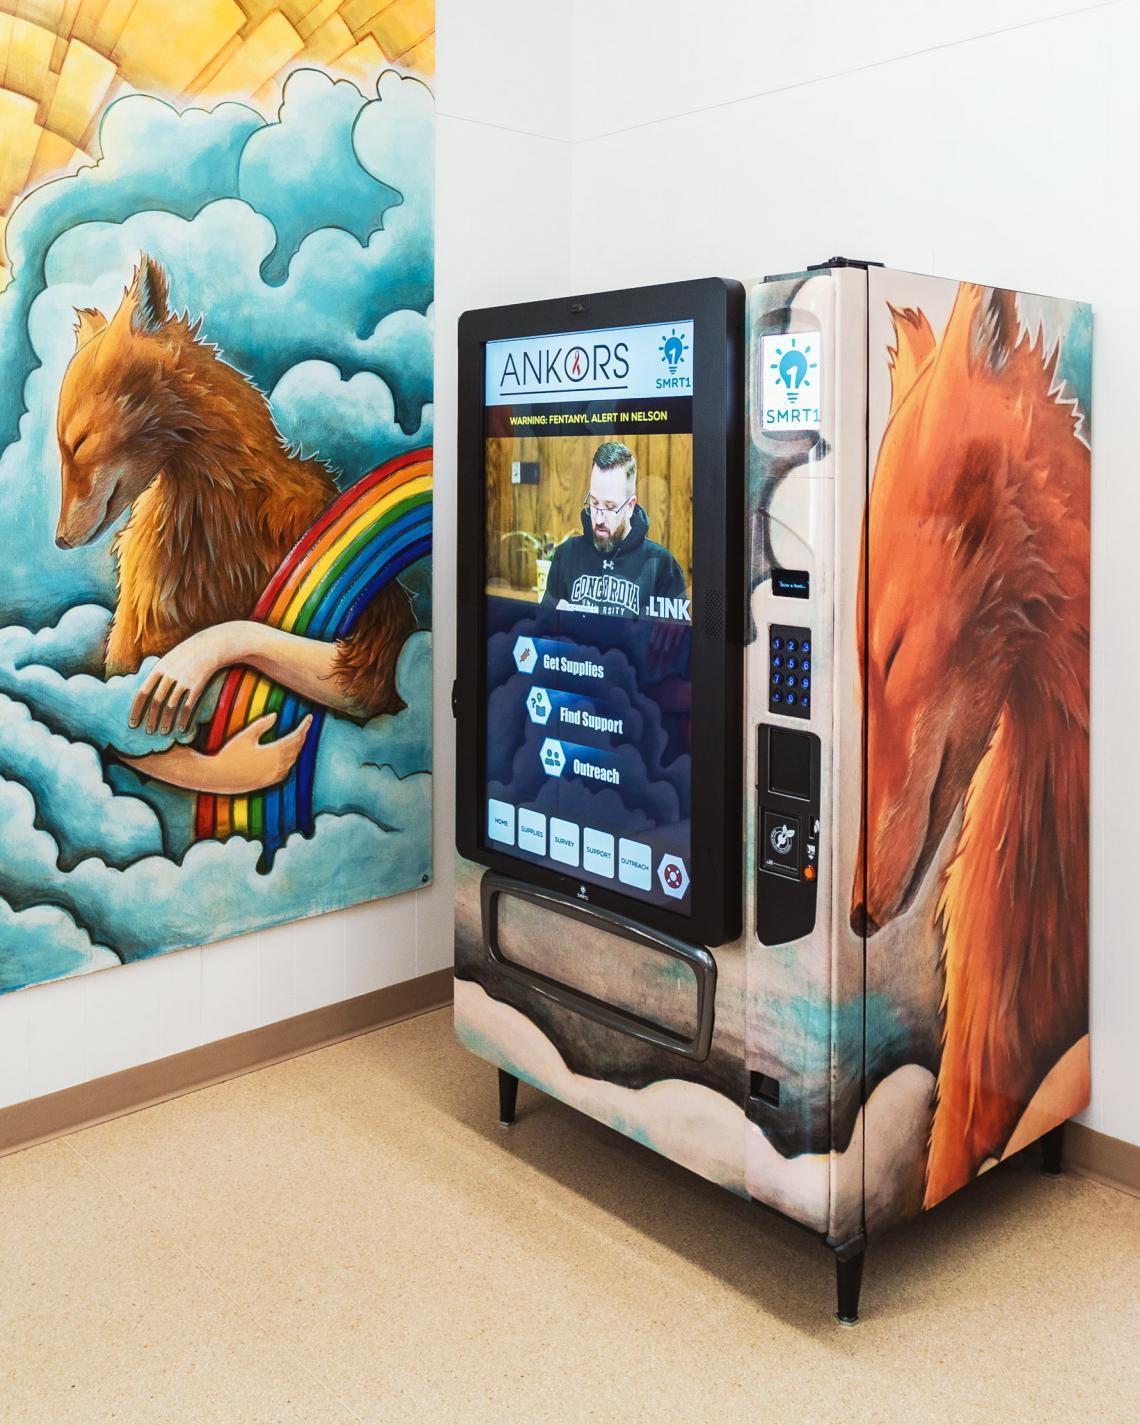 ANKORS: The Harm Reduction Vending Machine